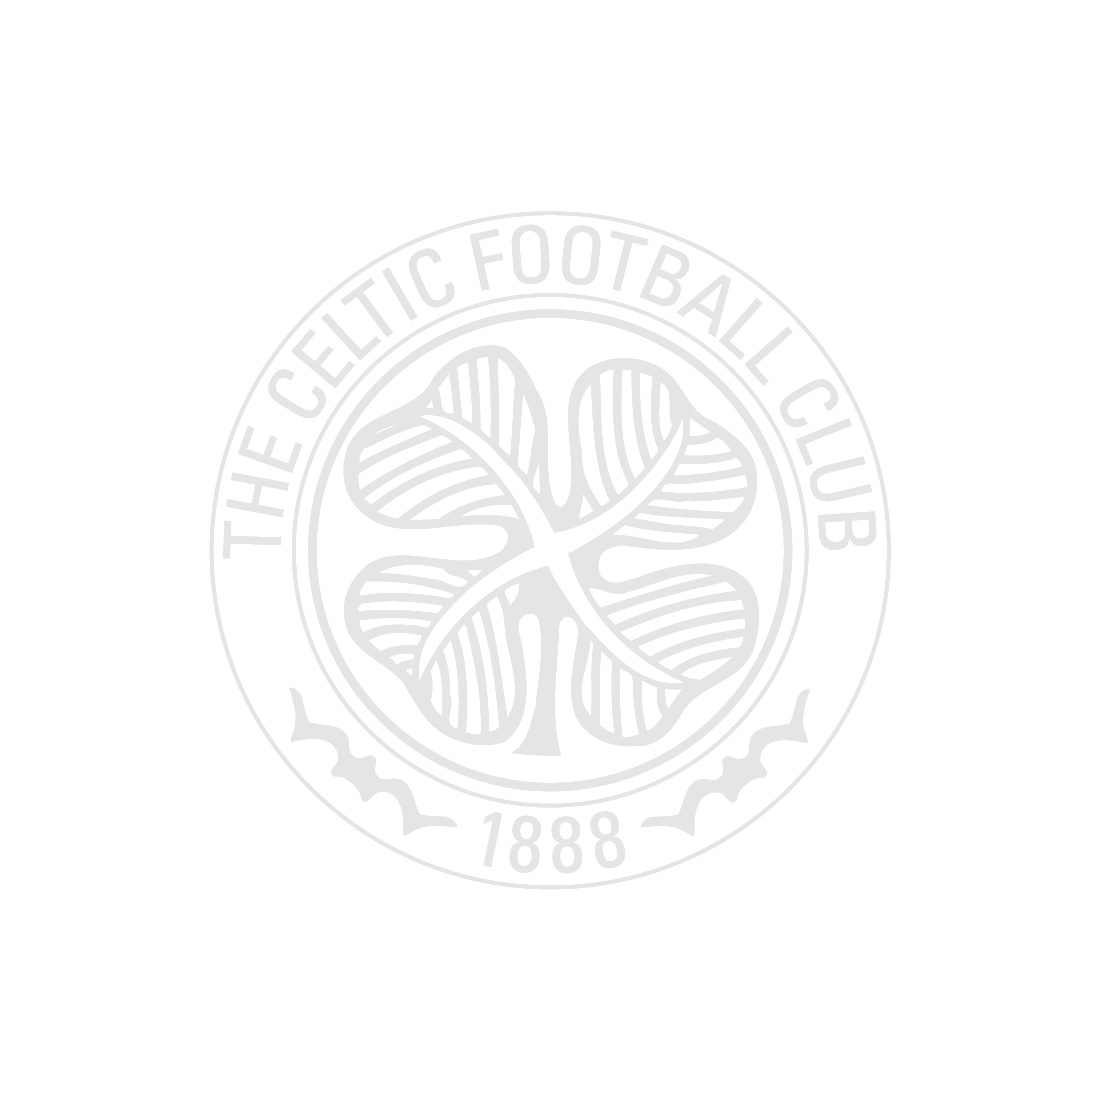 1988 Centenary Retro Celtic Jersey